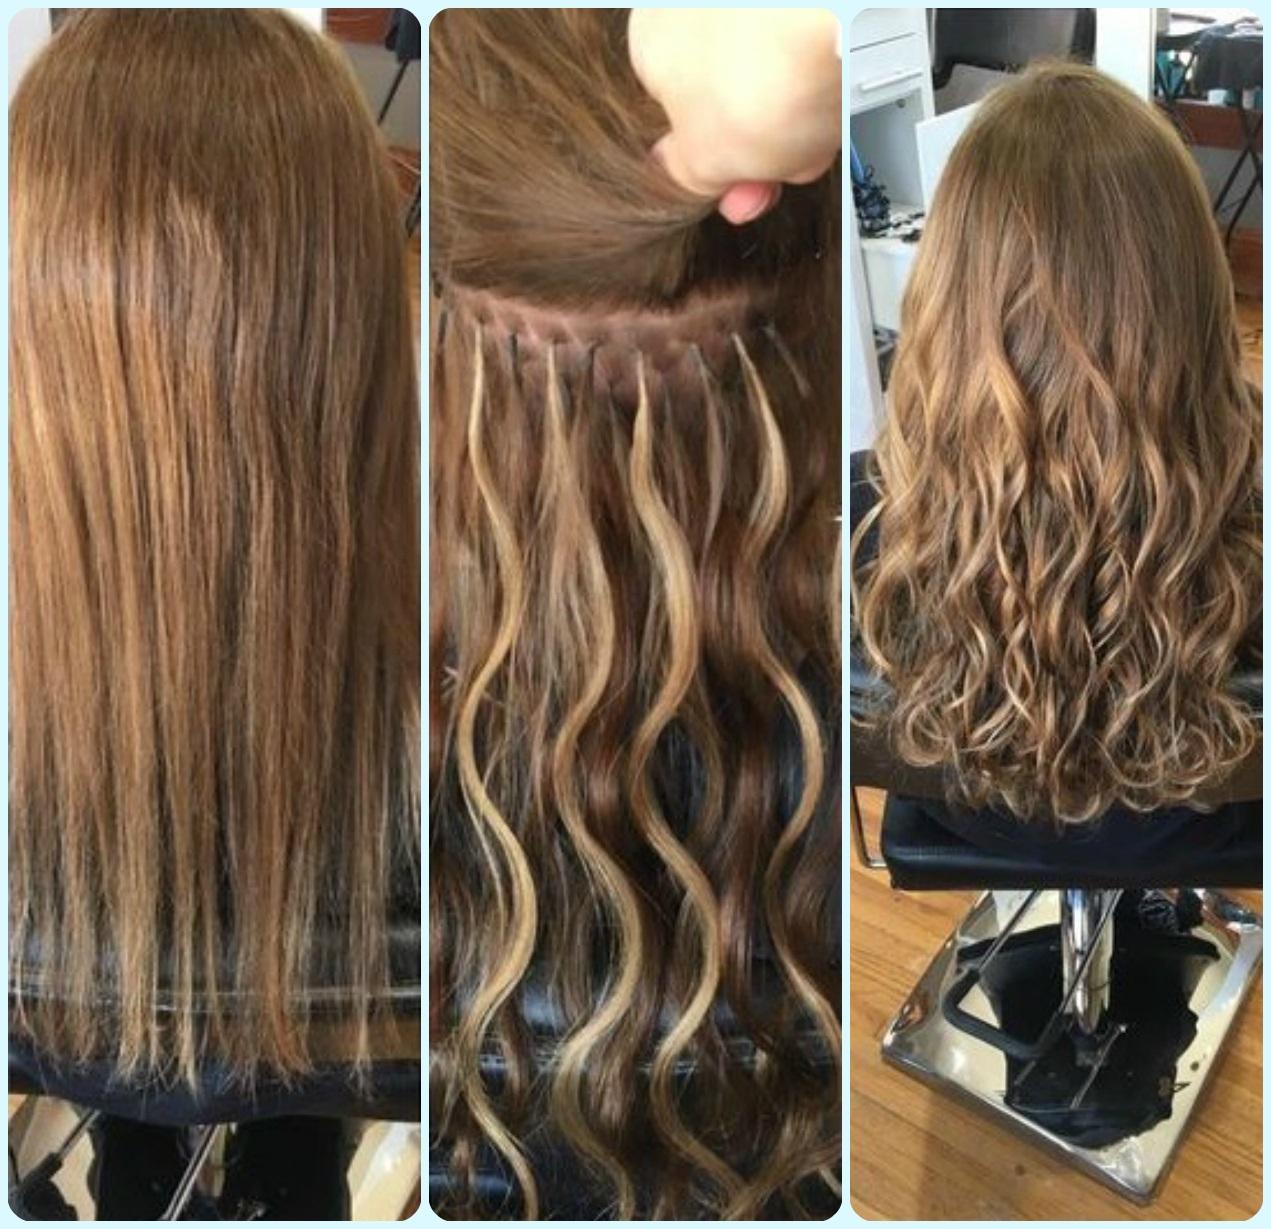 фото ленточное наращивание волос до и после